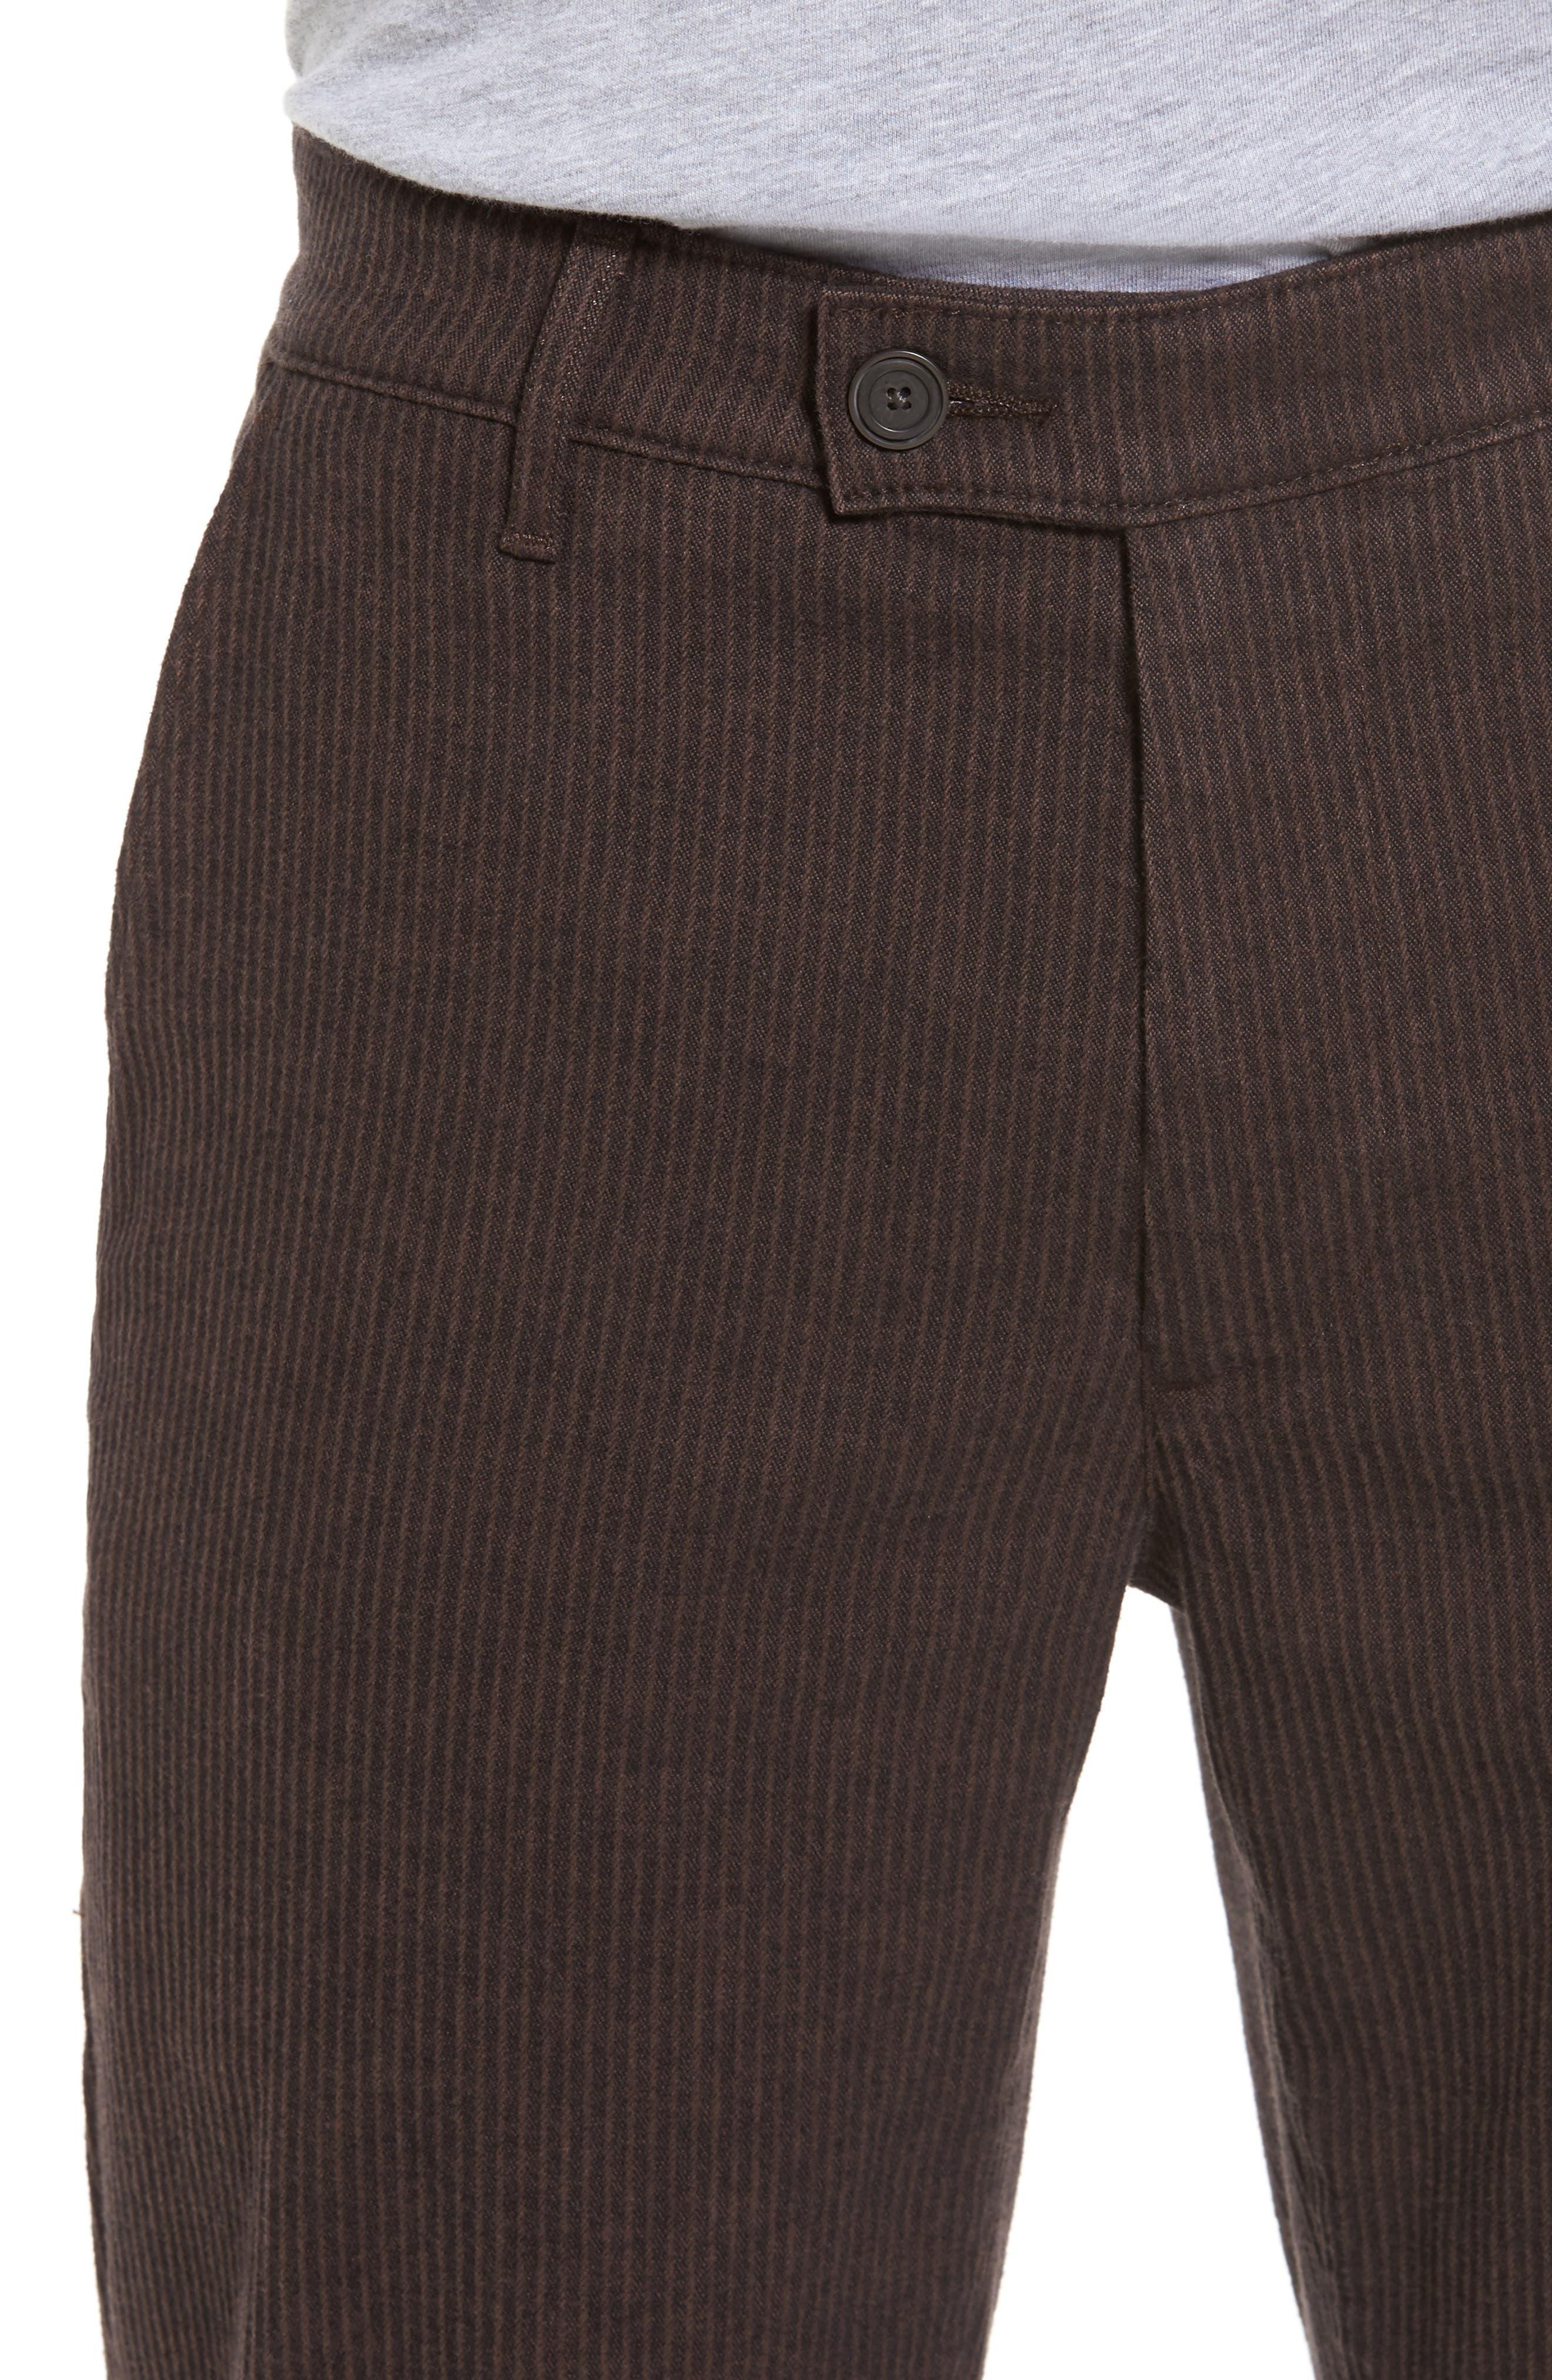 Marshall Slim Fit Pinstripe Pants,                             Alternate thumbnail 4, color,                             Dark Oakwood